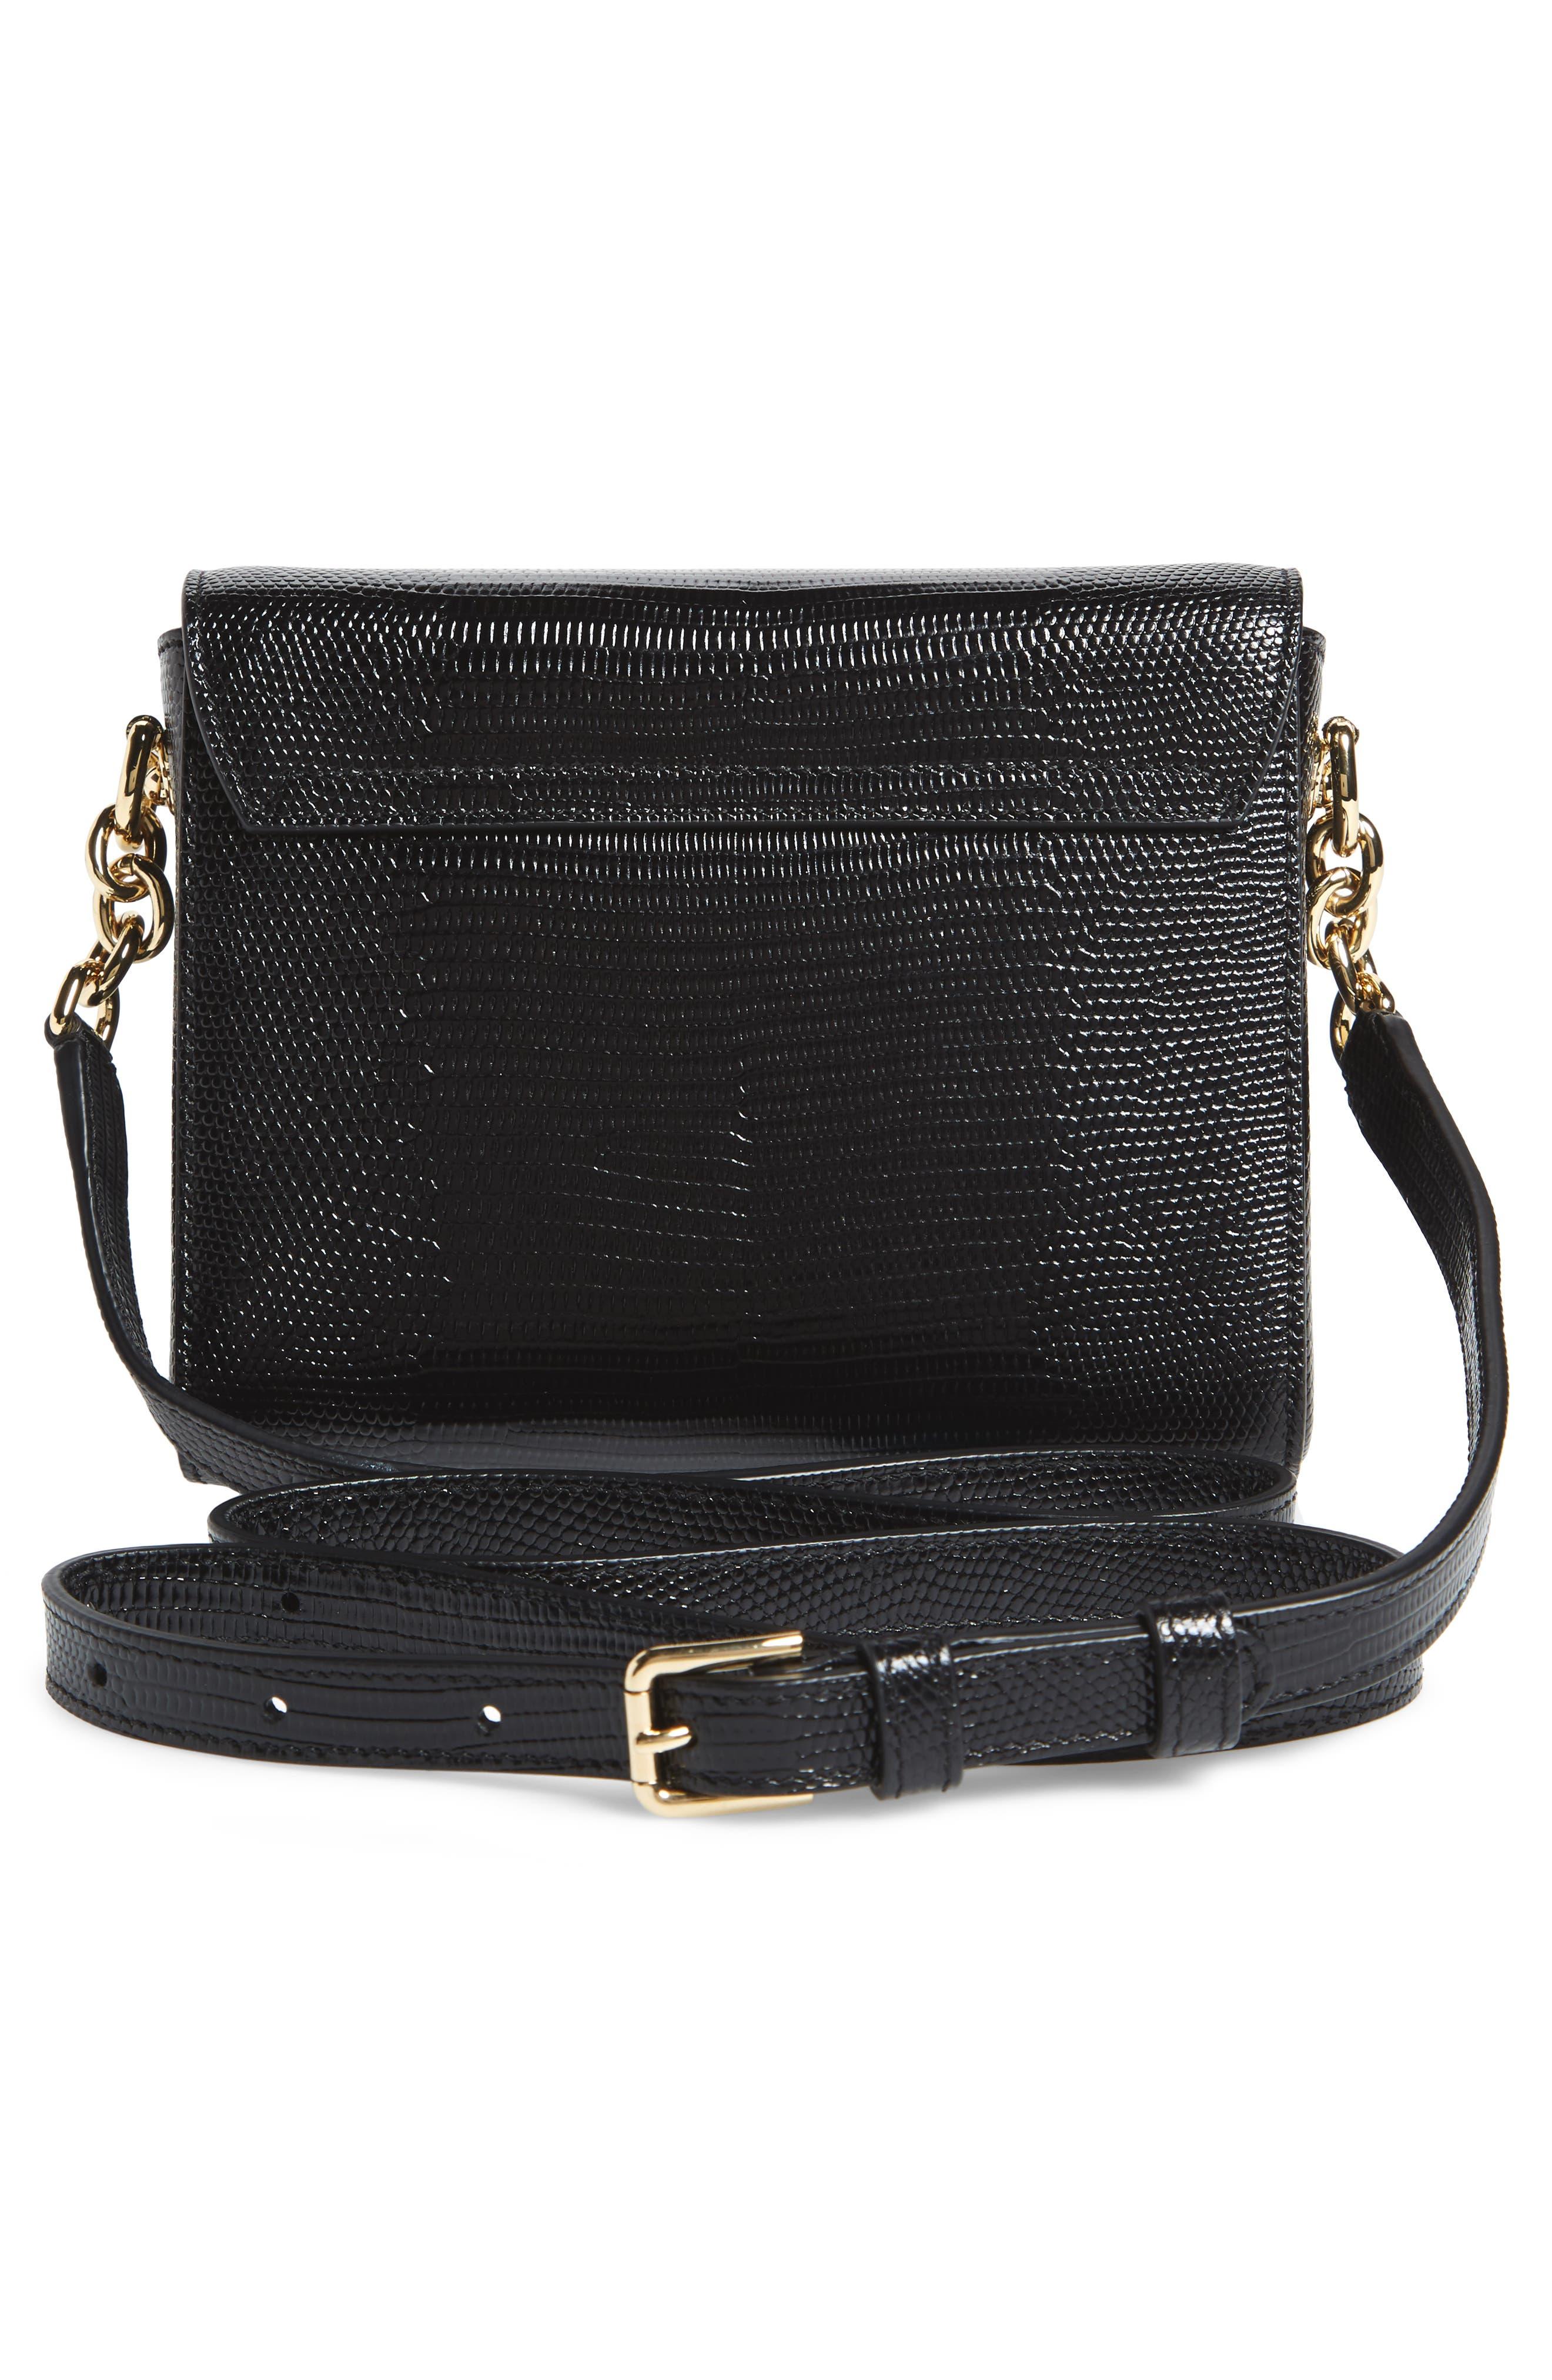 Millennial Reptile Embossed Leather Crossbody Bag,                             Alternate thumbnail 3, color,                             NERO